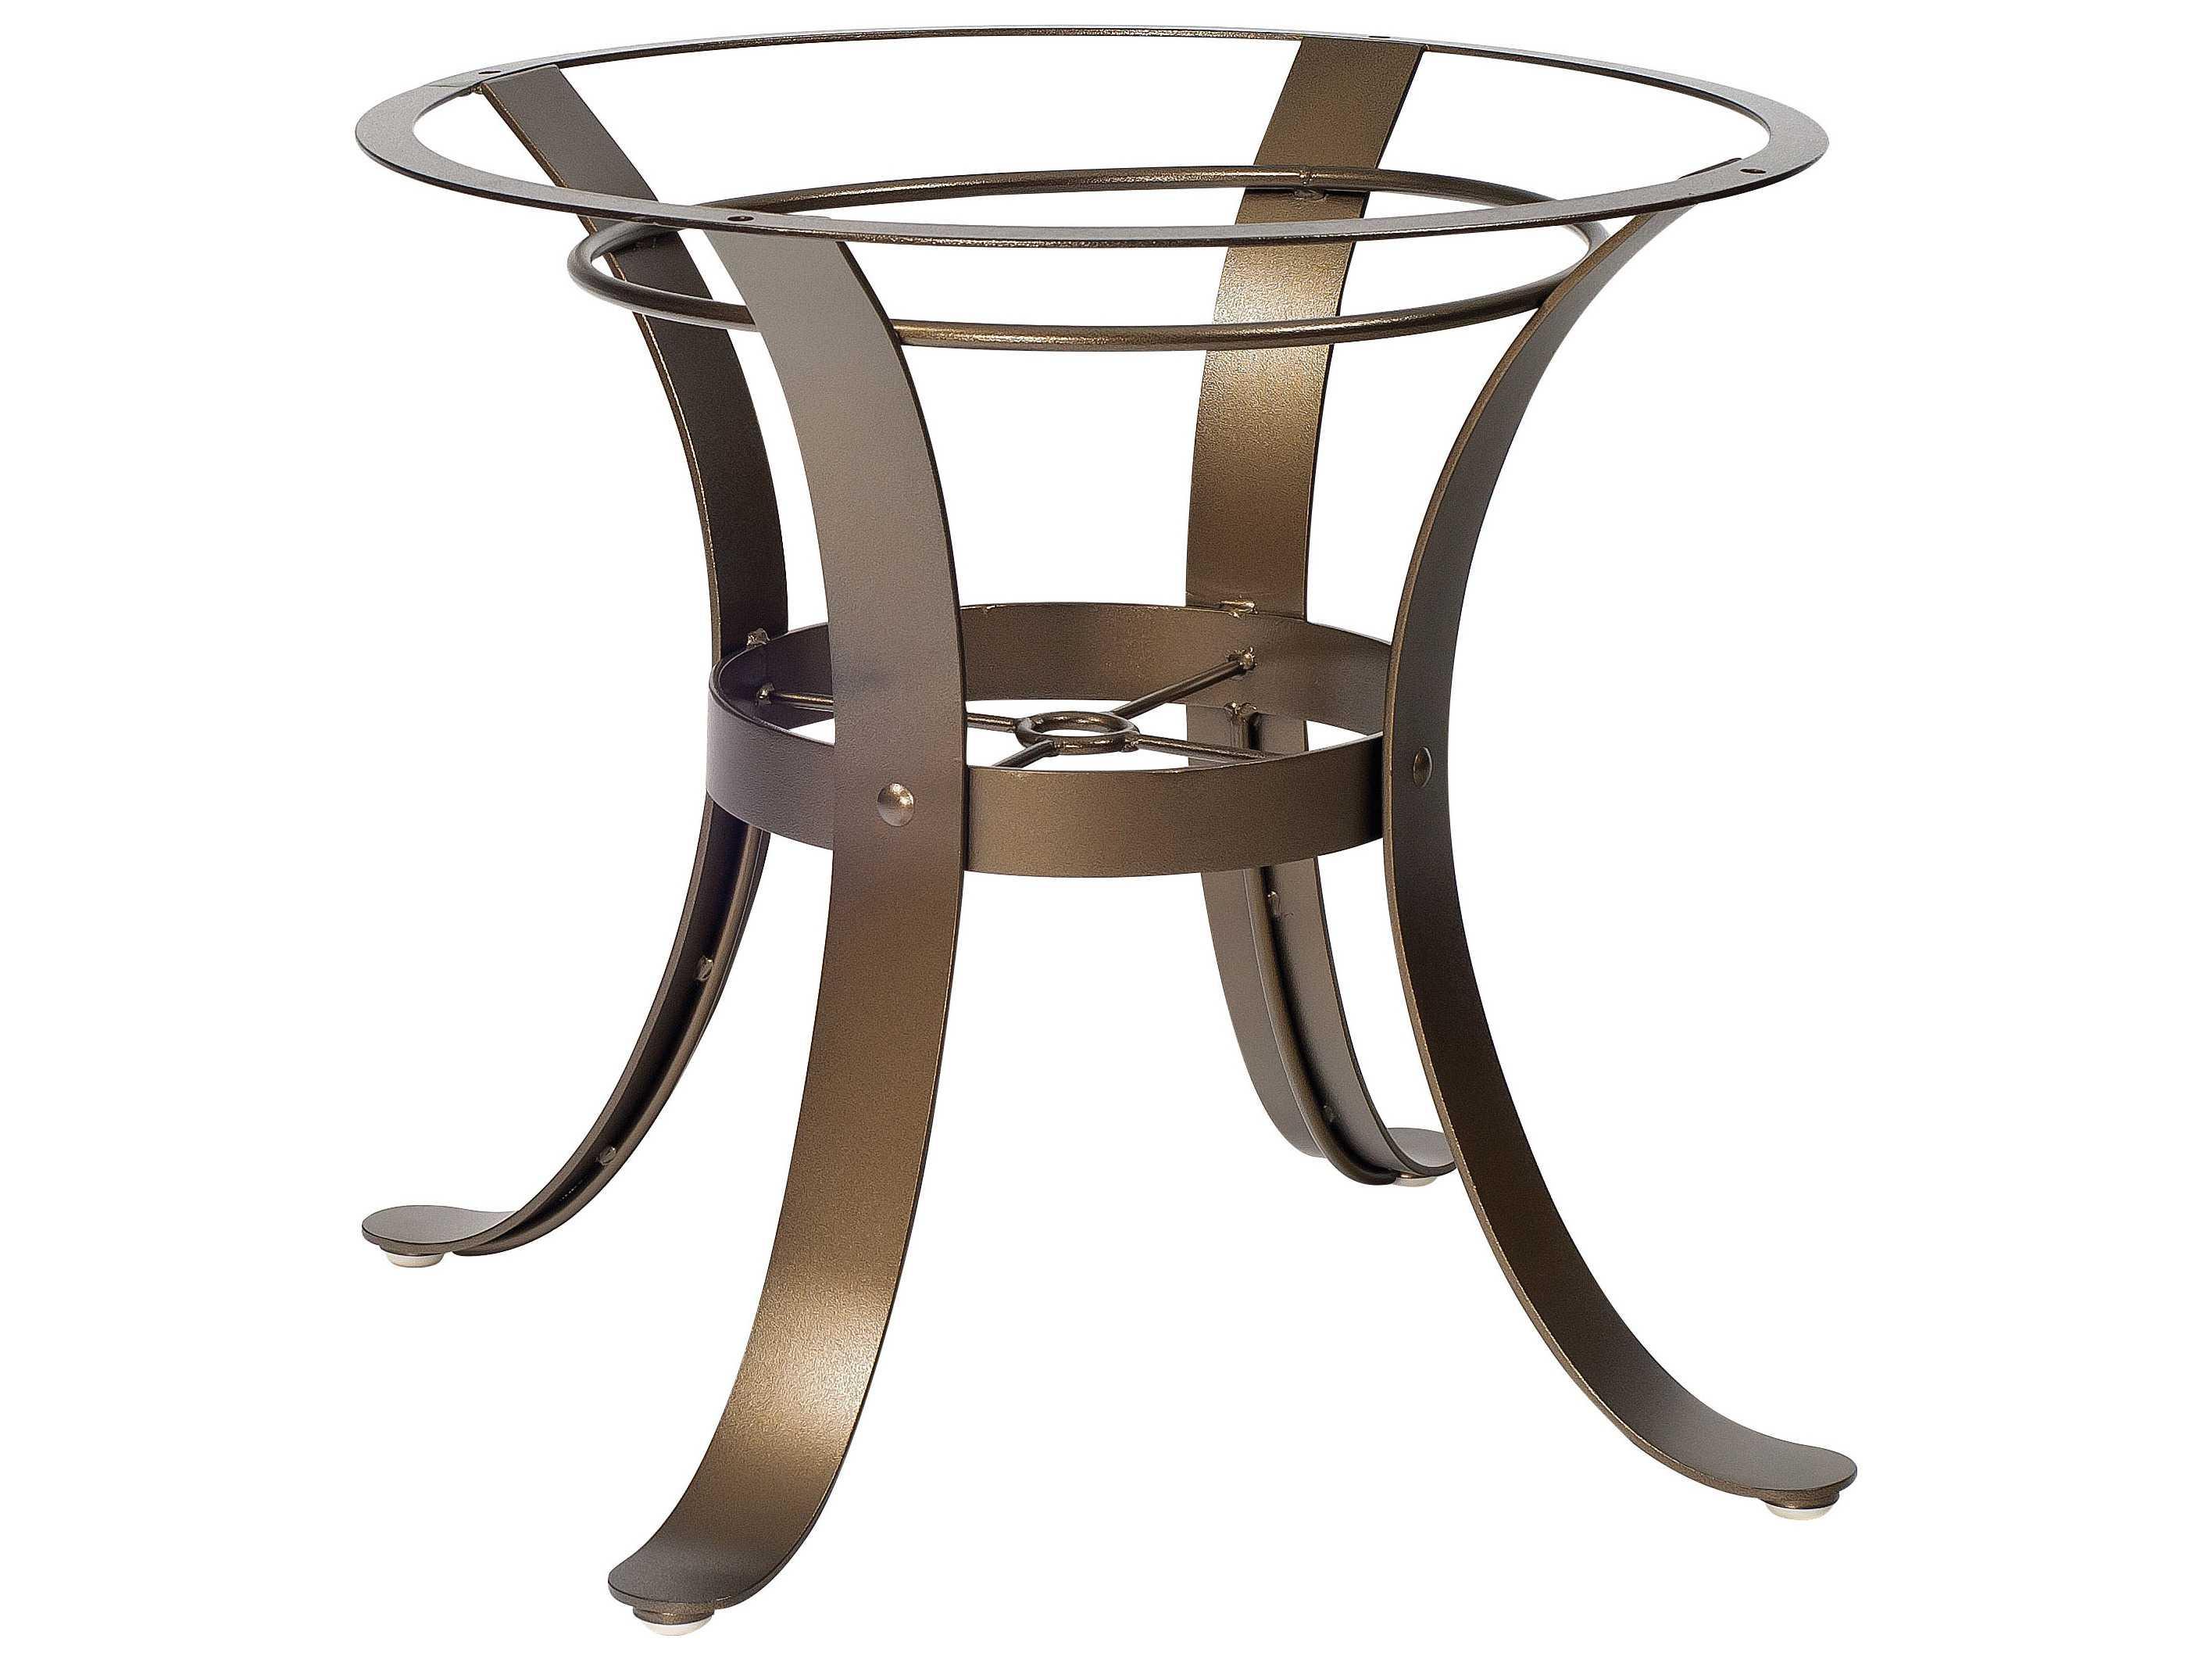 Woodard cascade wrought iron dining table base 2w4800 for Outdoor table bases wrought iron